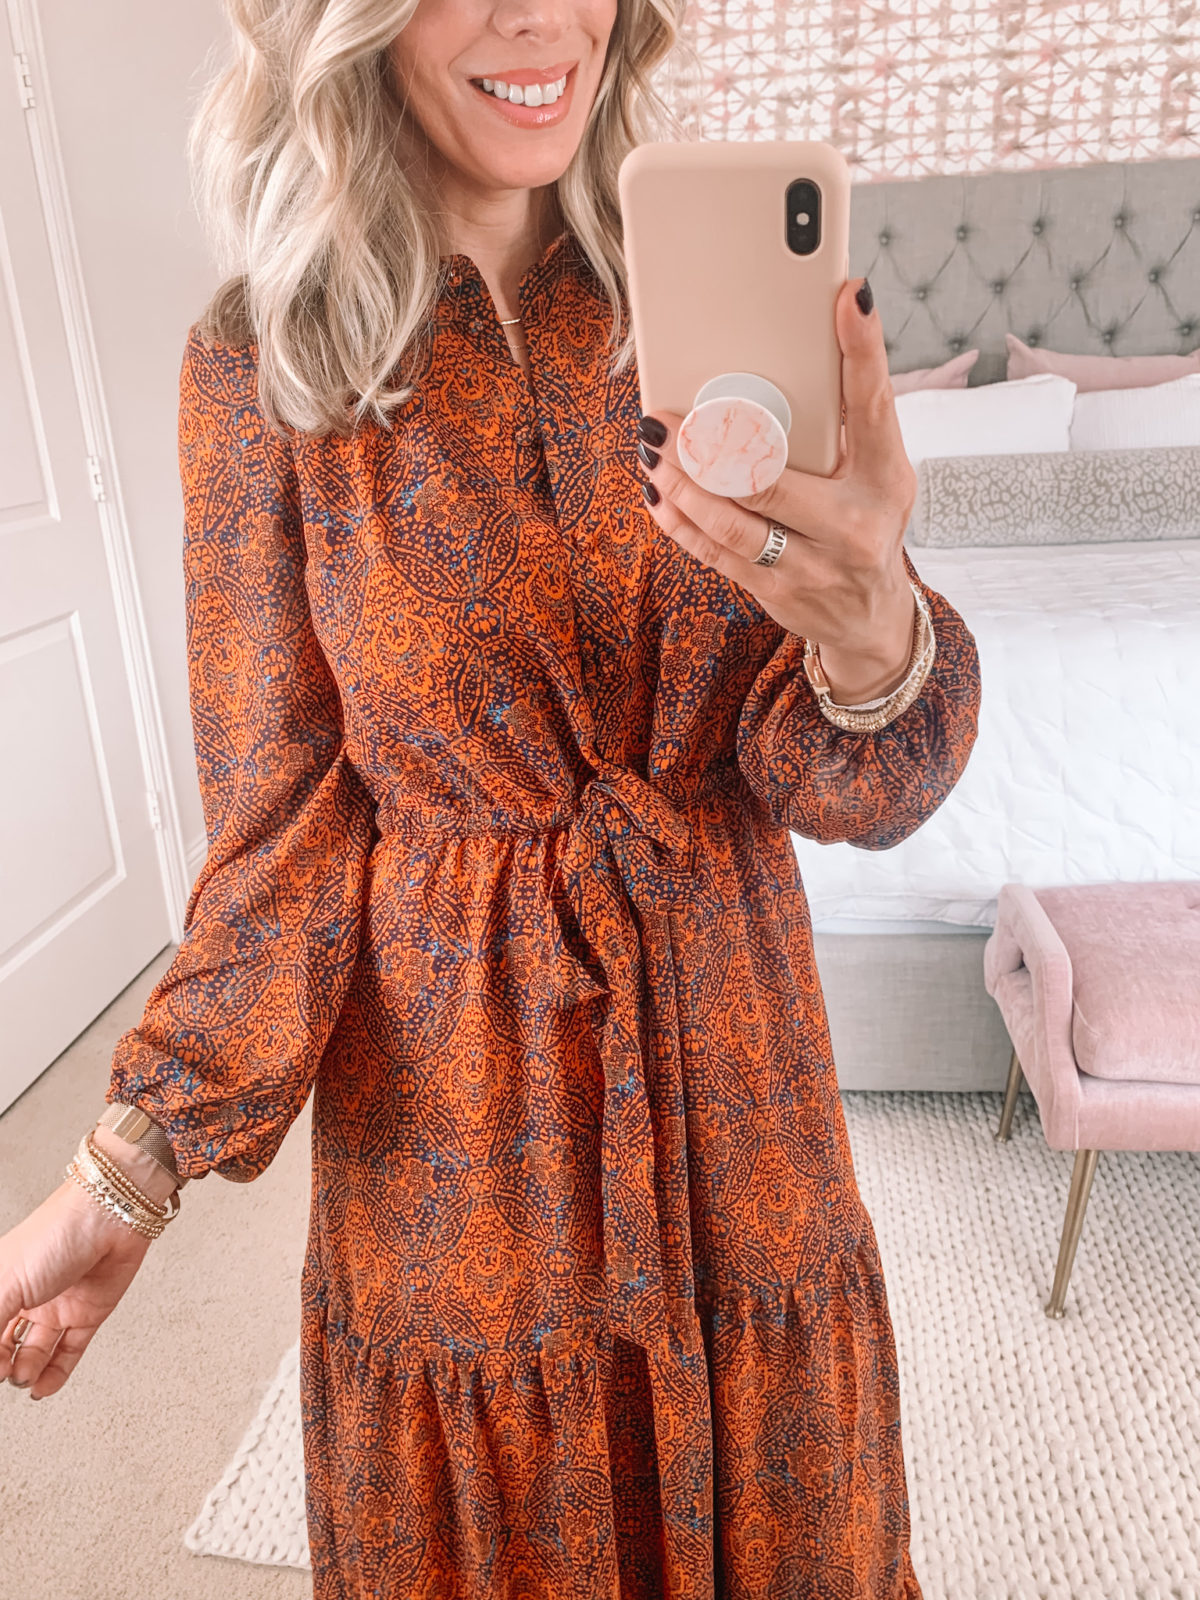 Walmart Fashion, Long Sleeve Maxi Dress, Fall